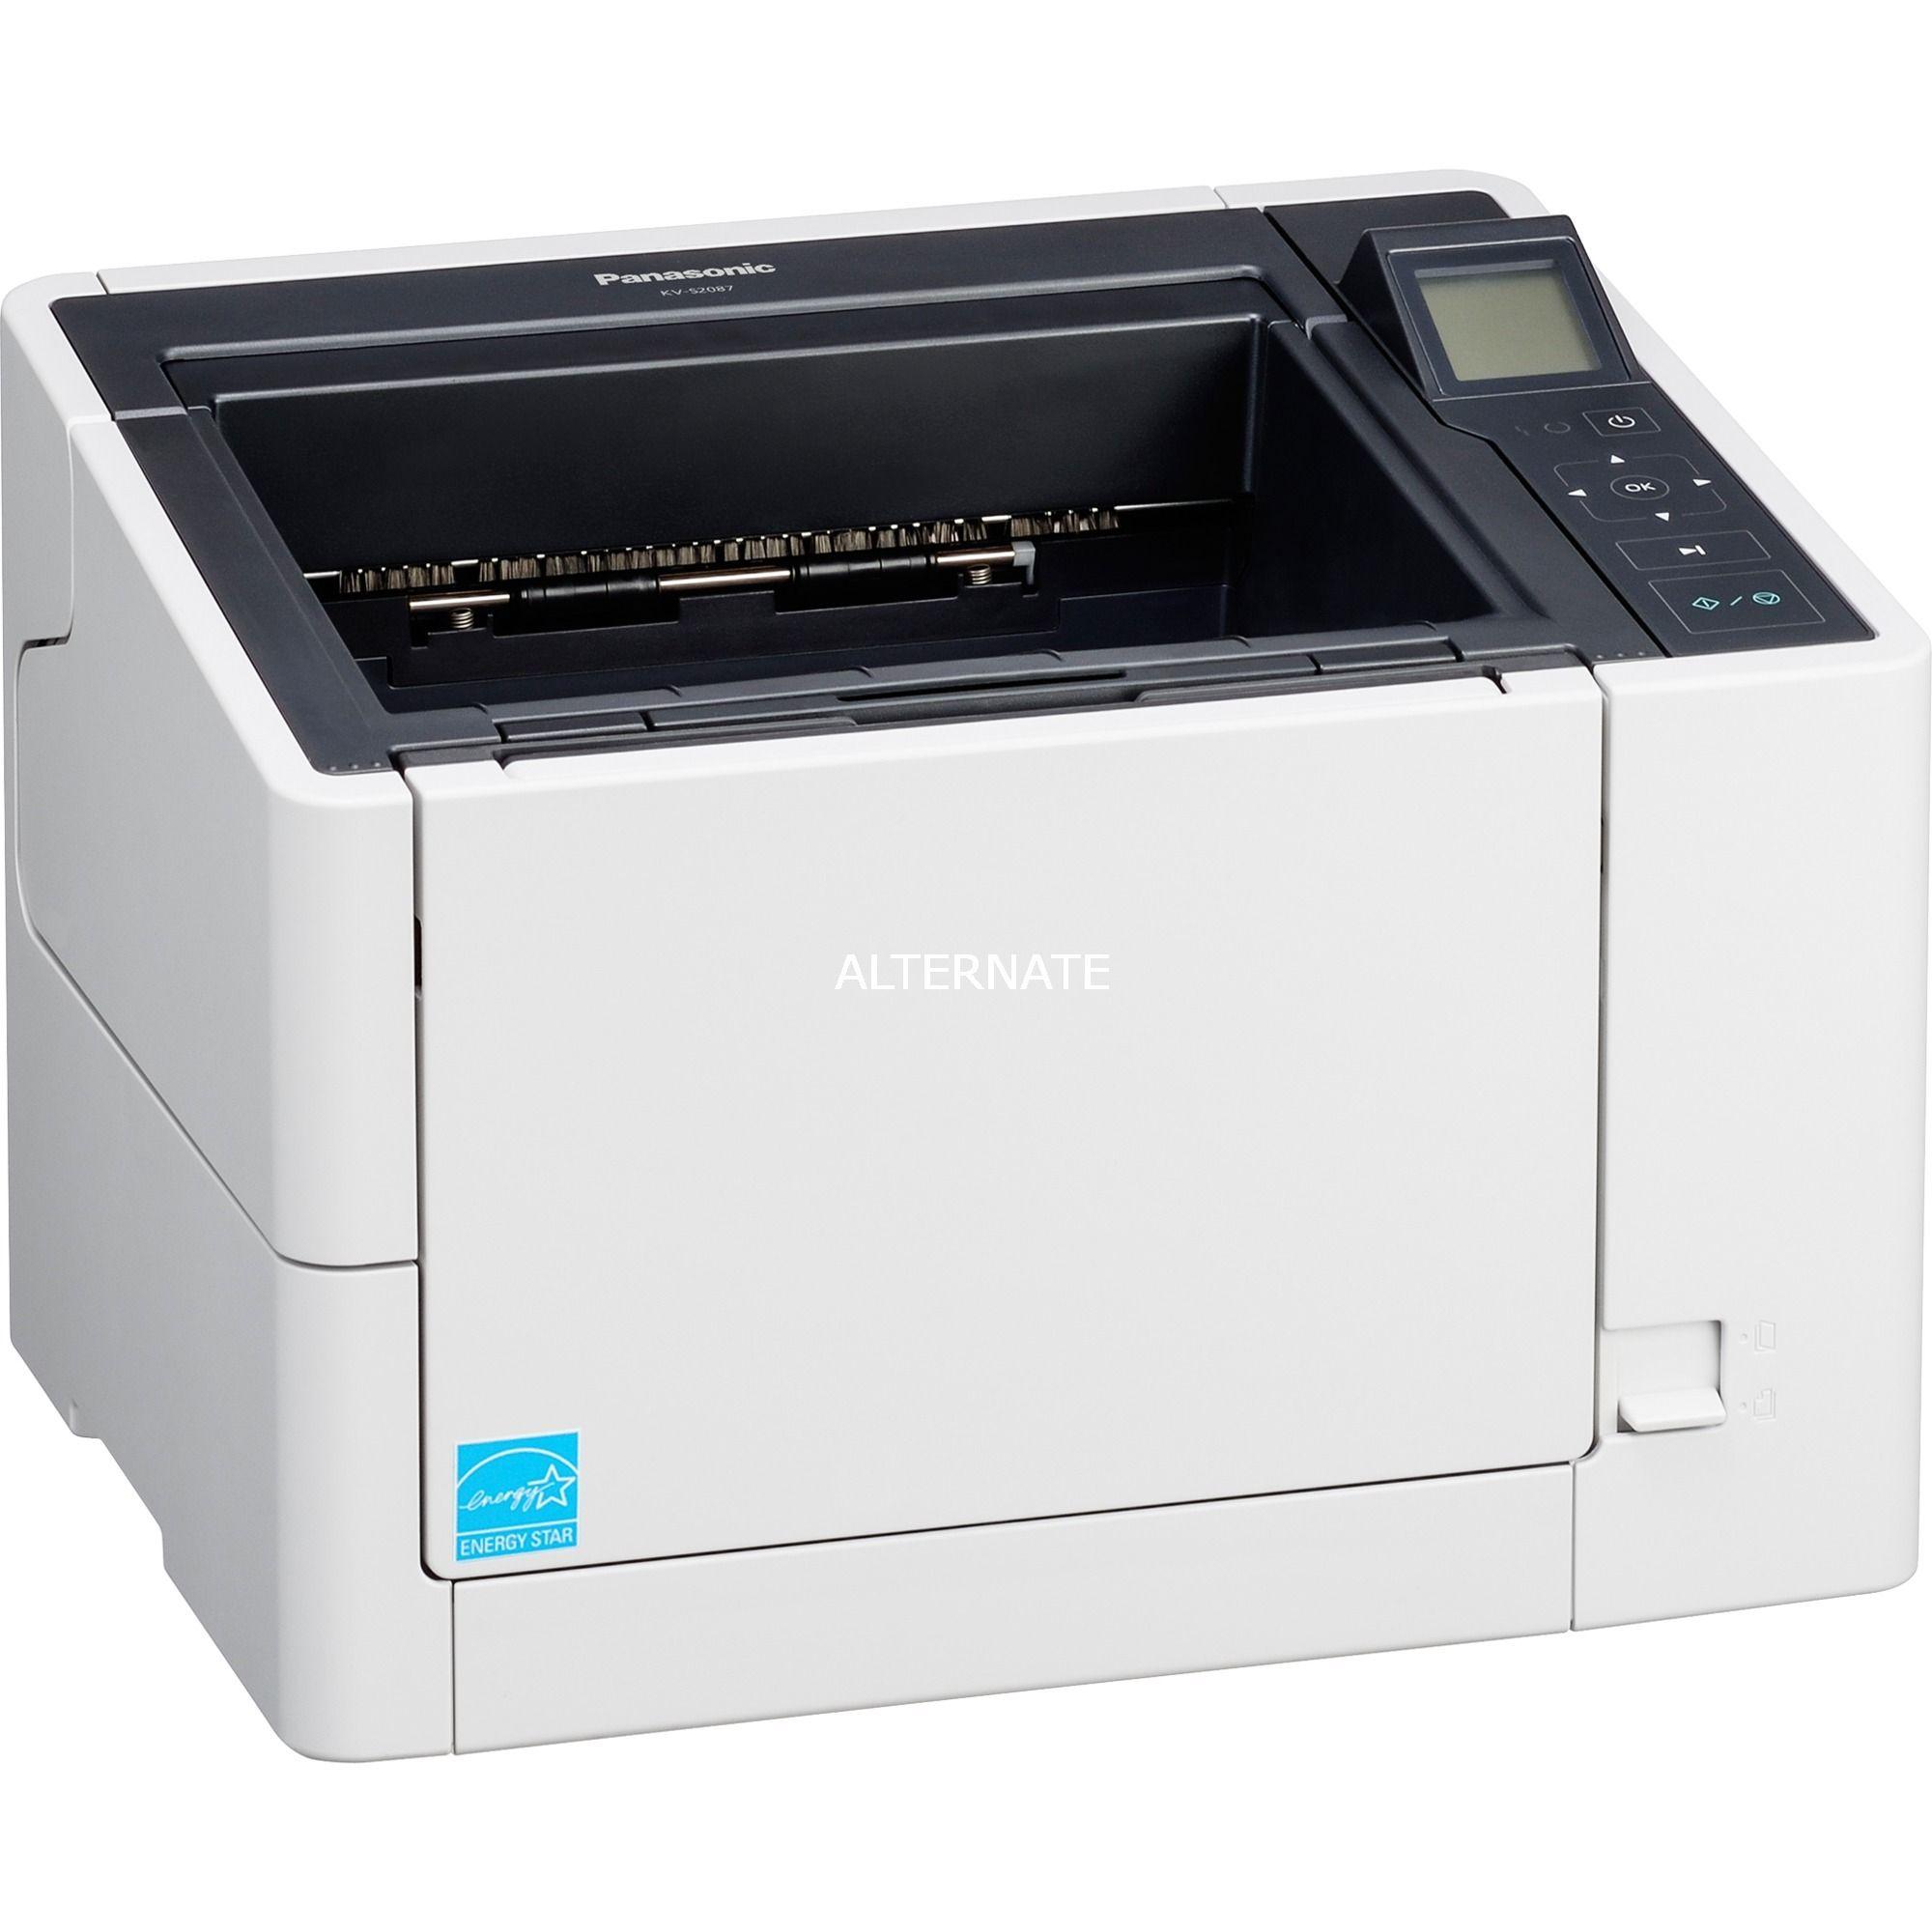 logiciel scanner canon mp250